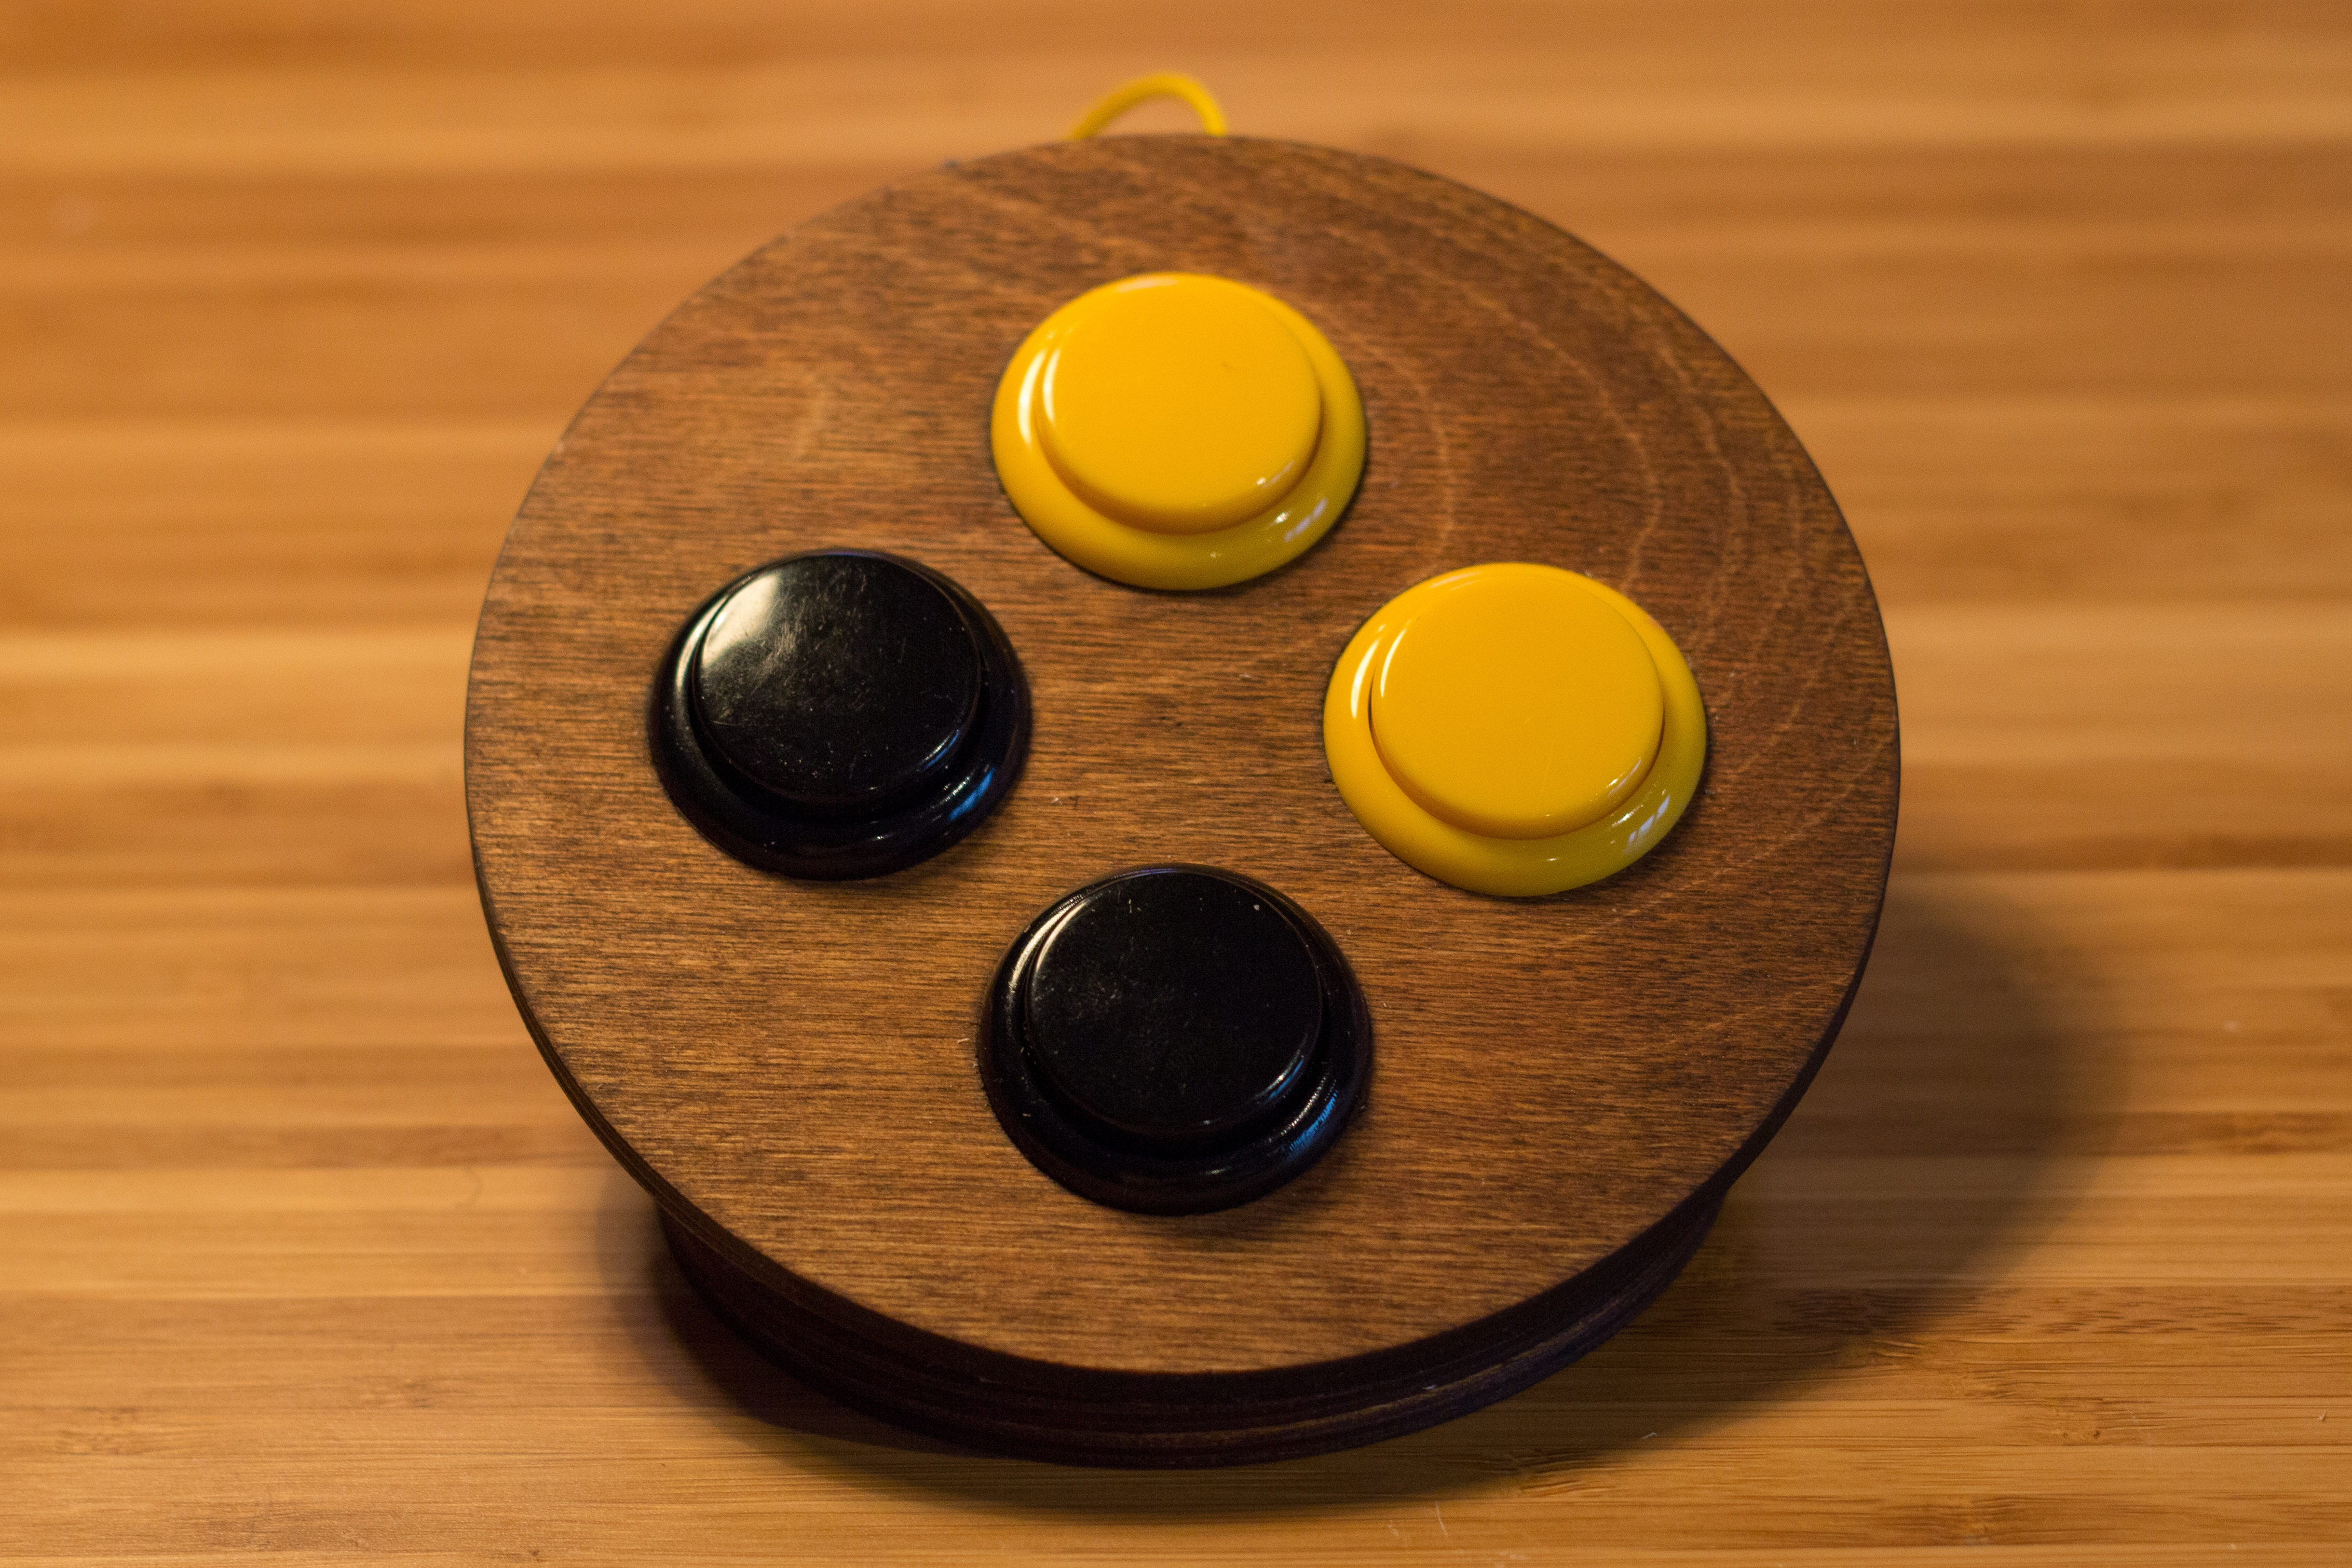 buttonPad